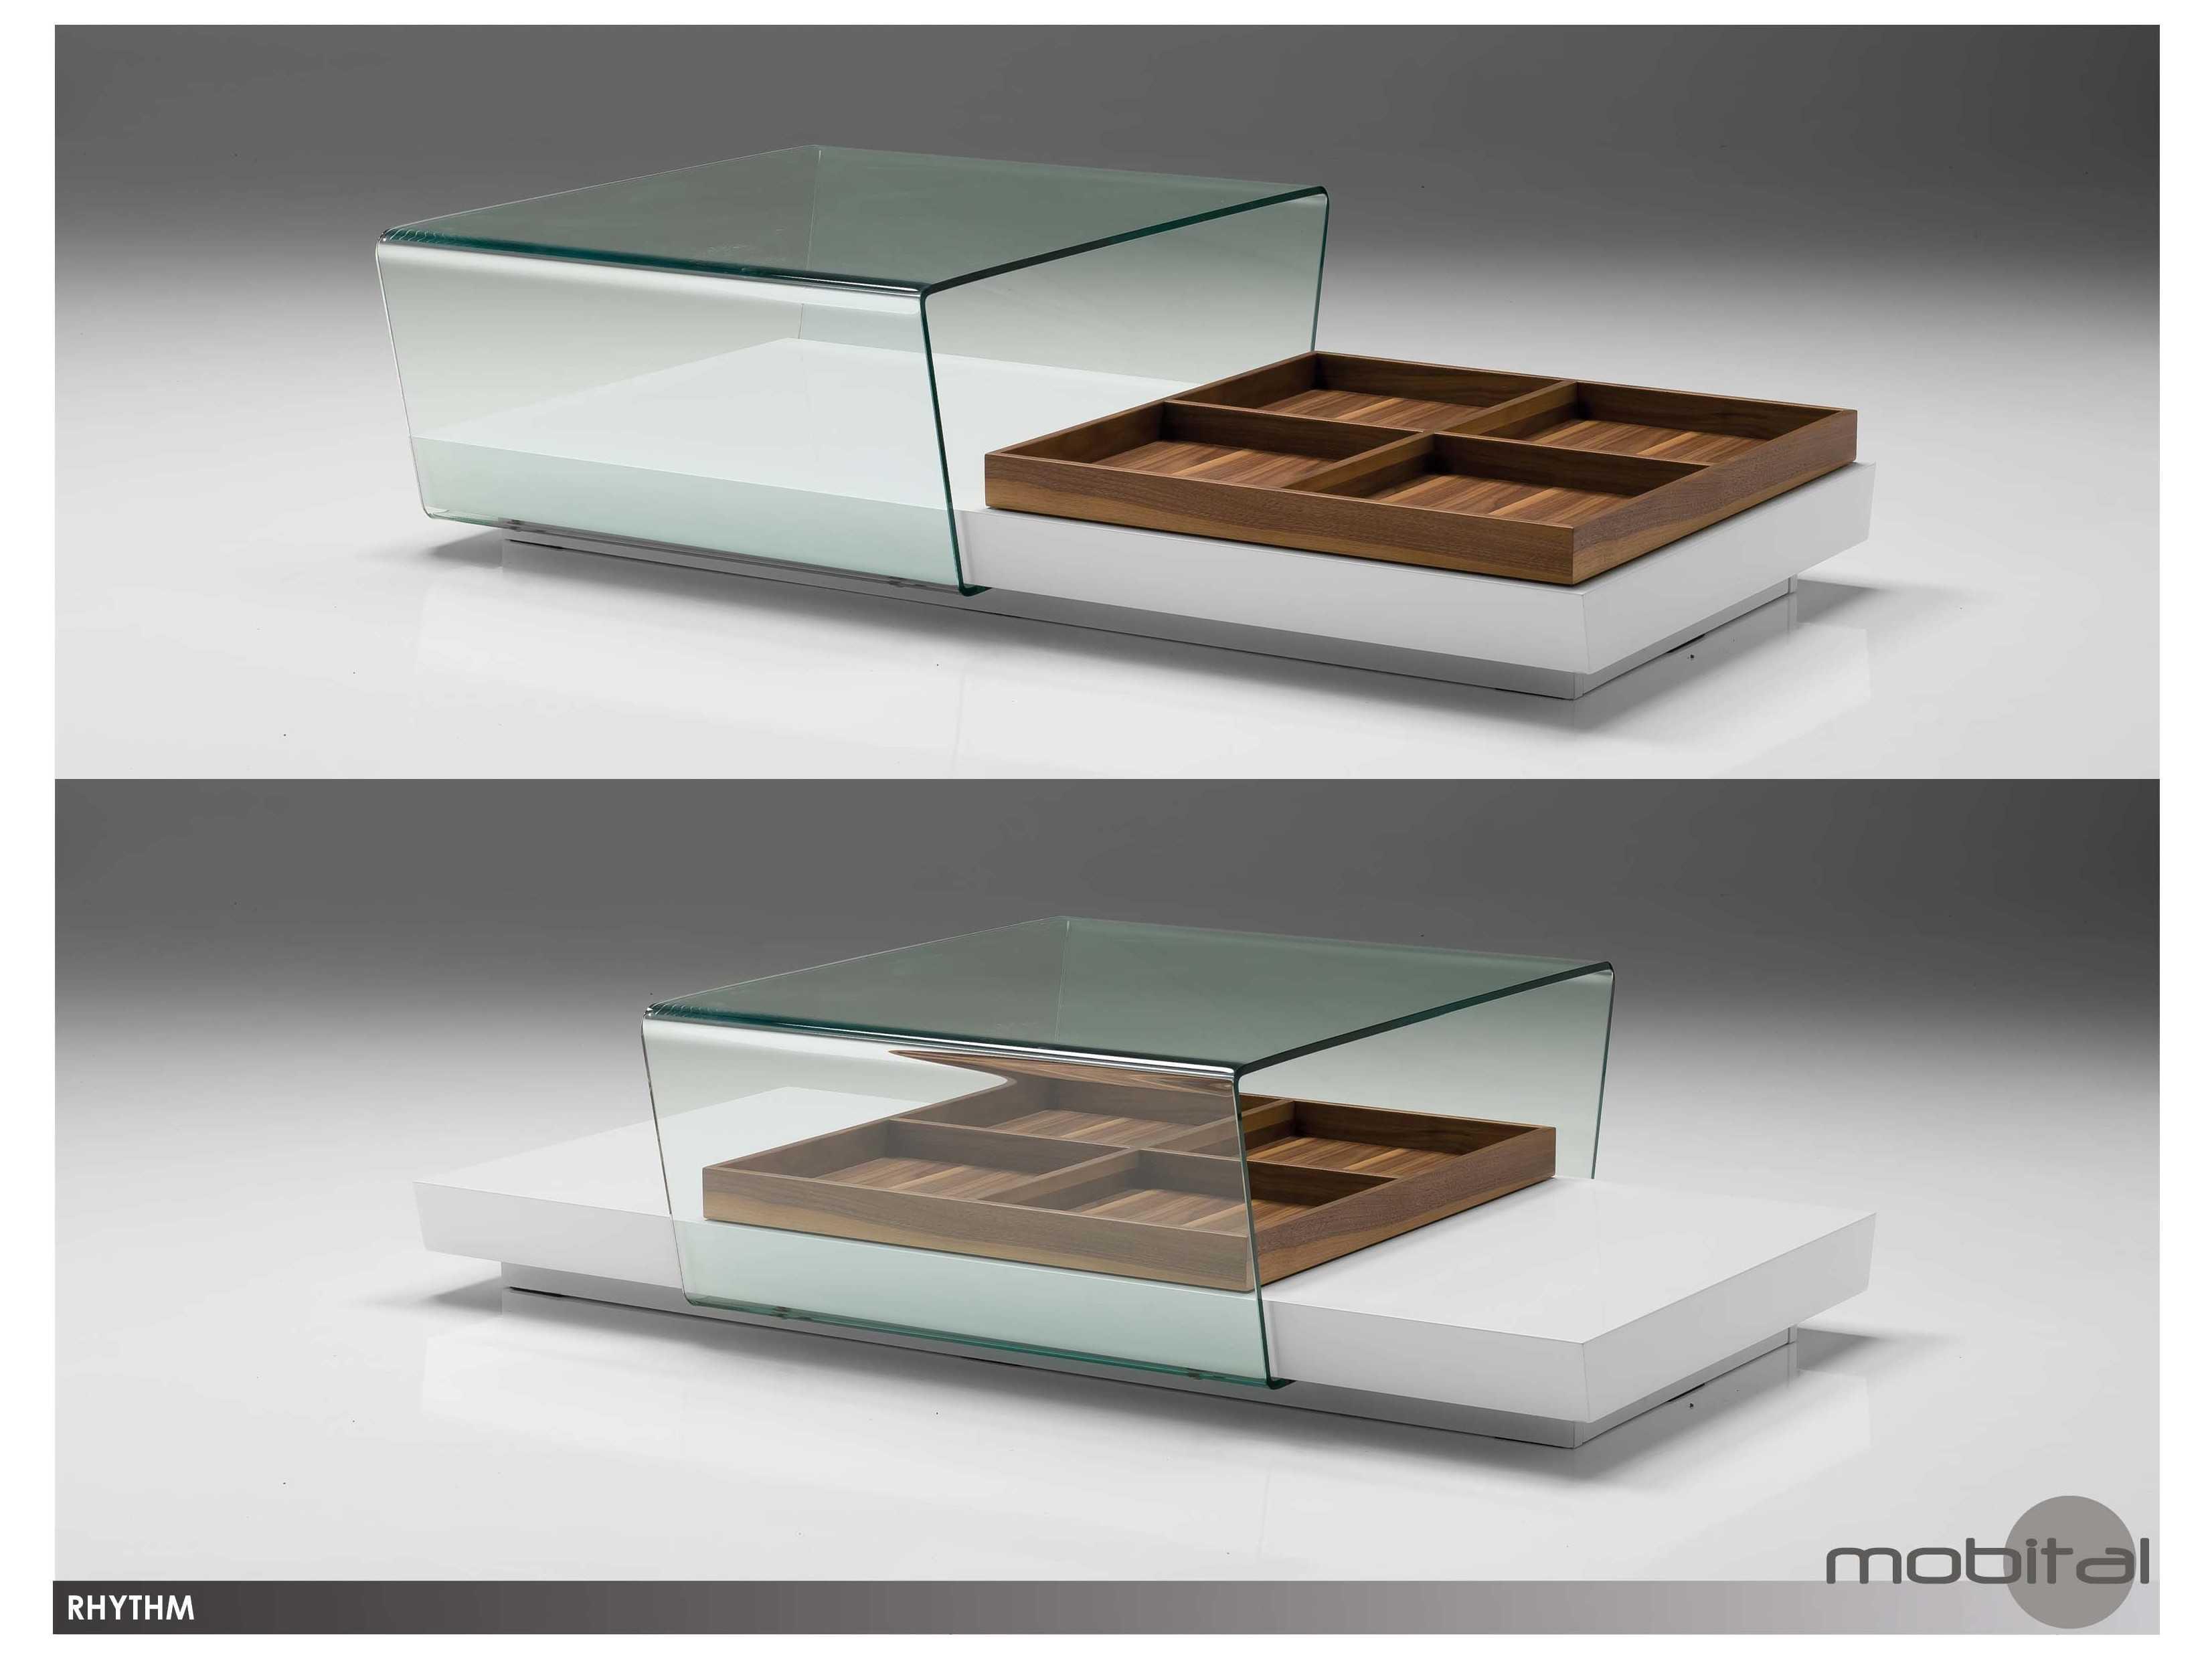 Mobital Rhythm White Sliding Glass 55 X 31 Coffee Table Mblcorhytwhitwalnu